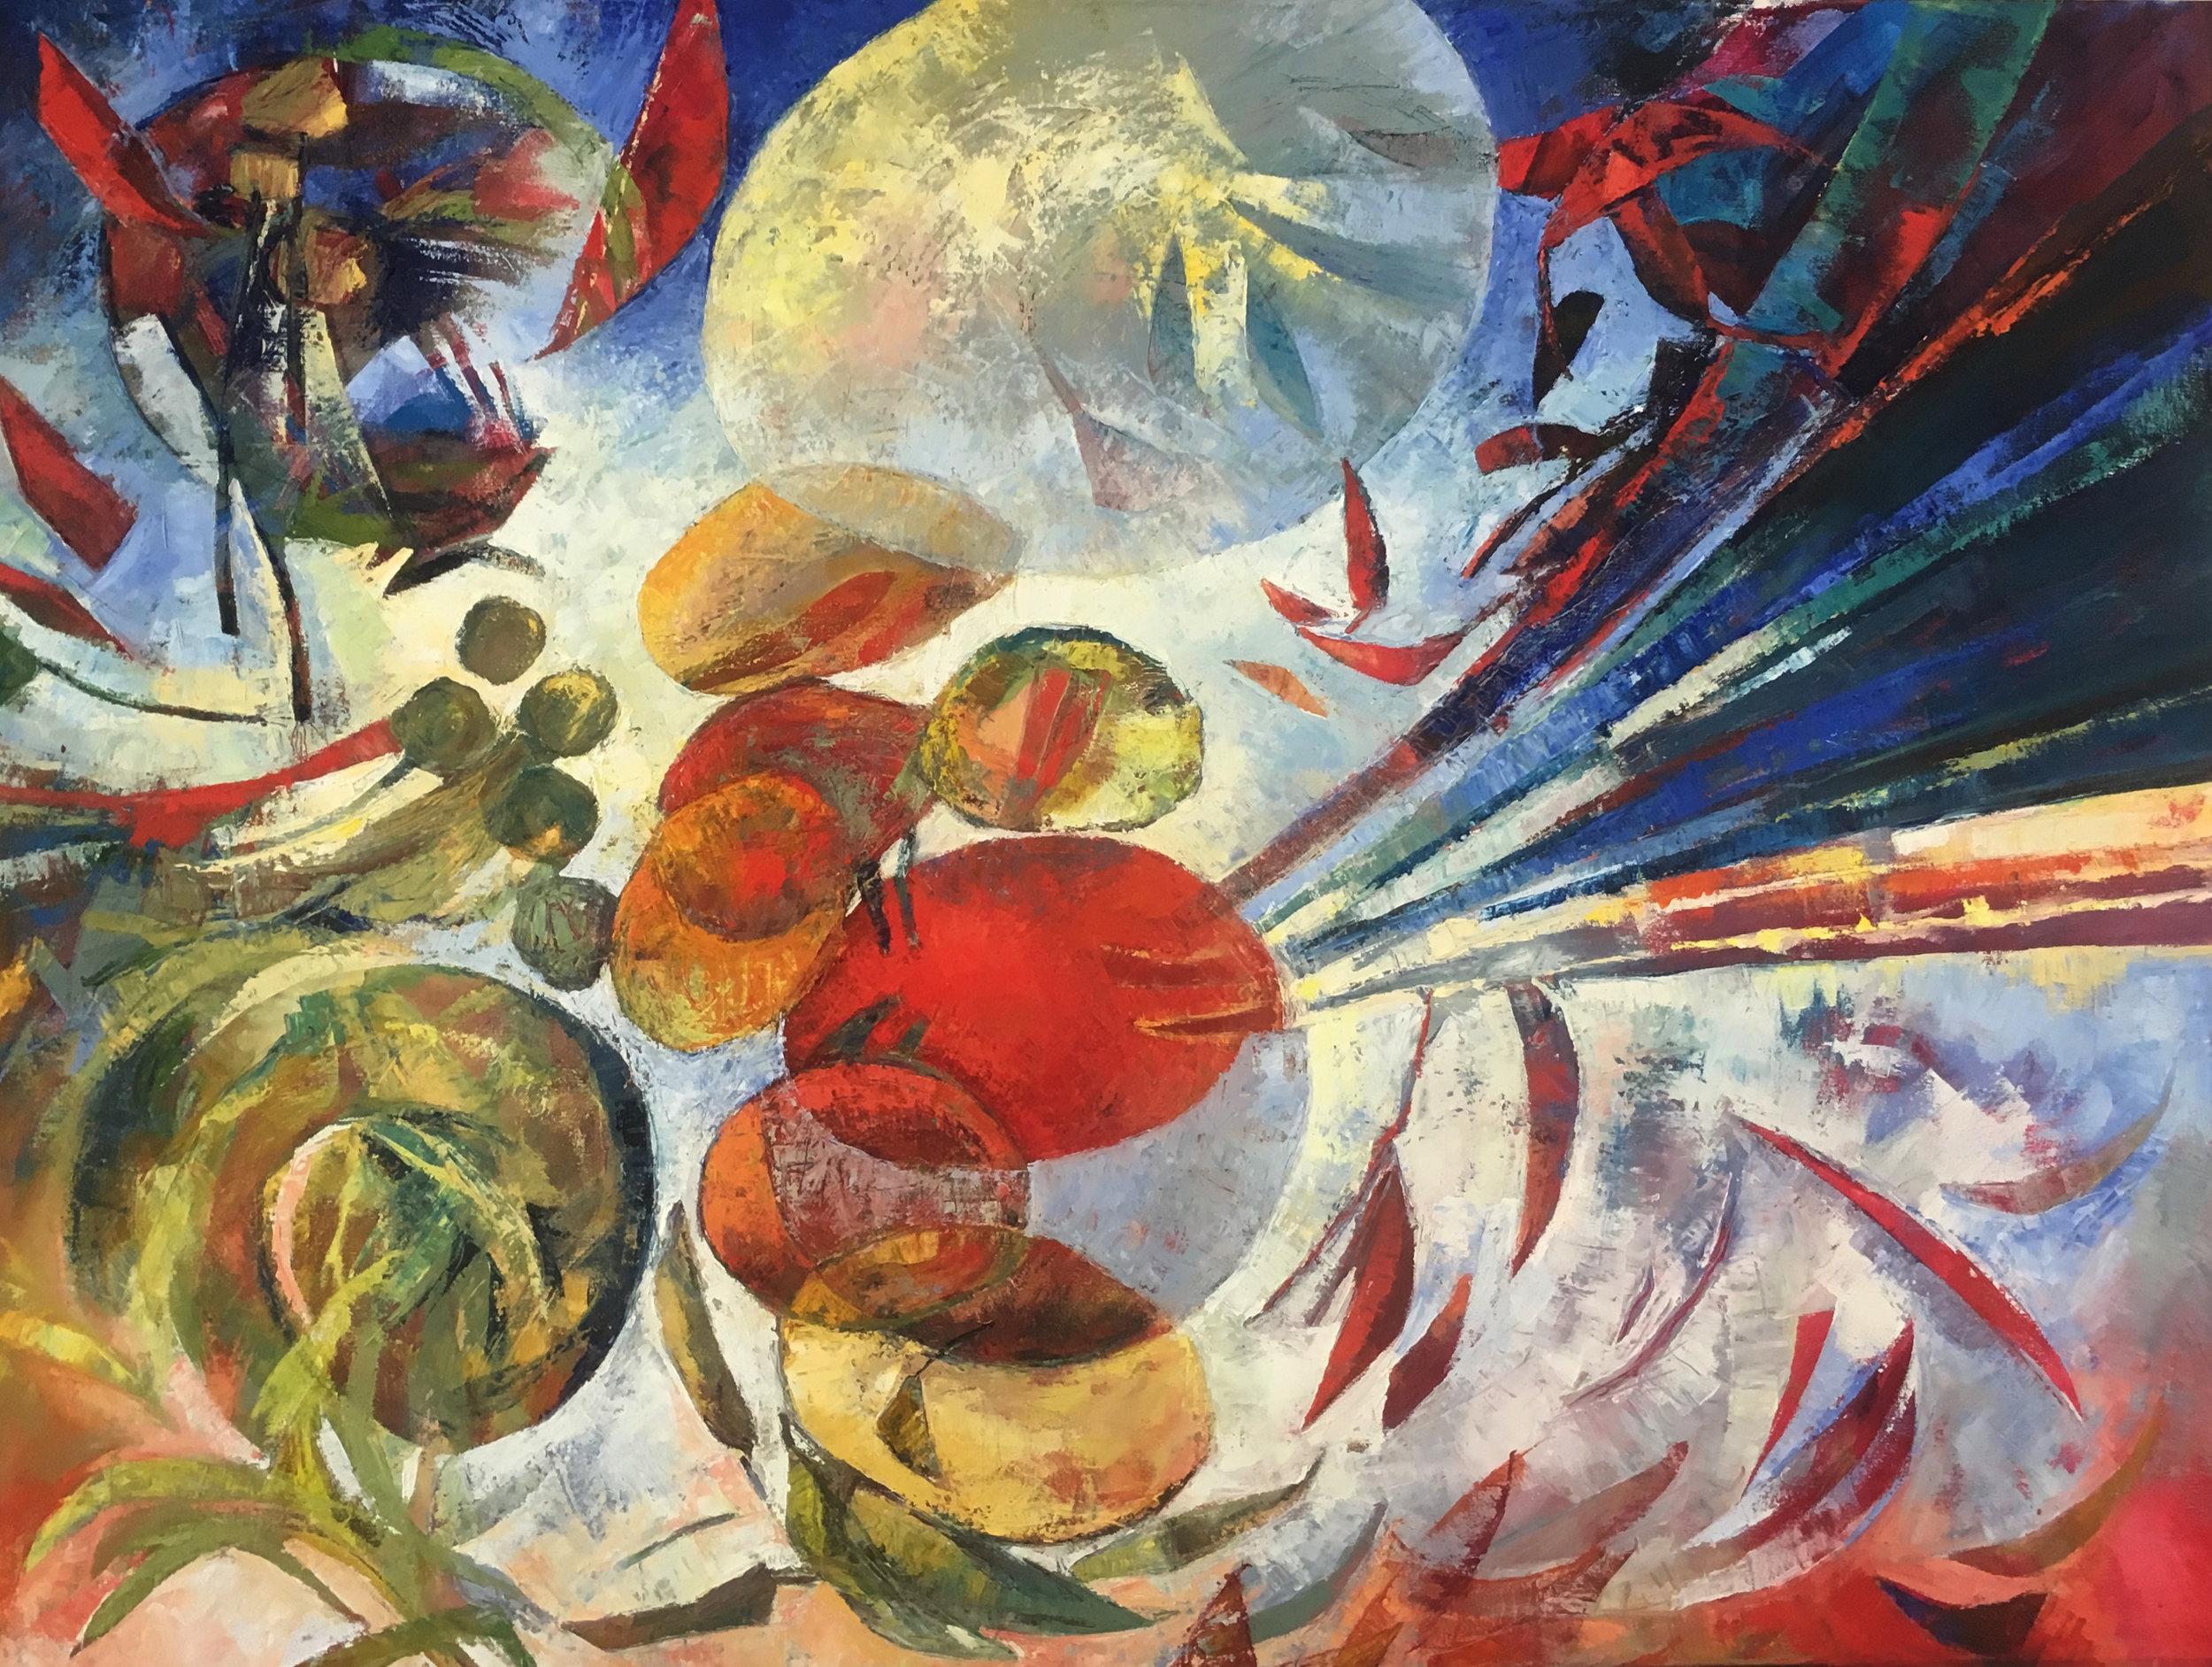 Santa Ana Winds   36 x 48  oil on canvas